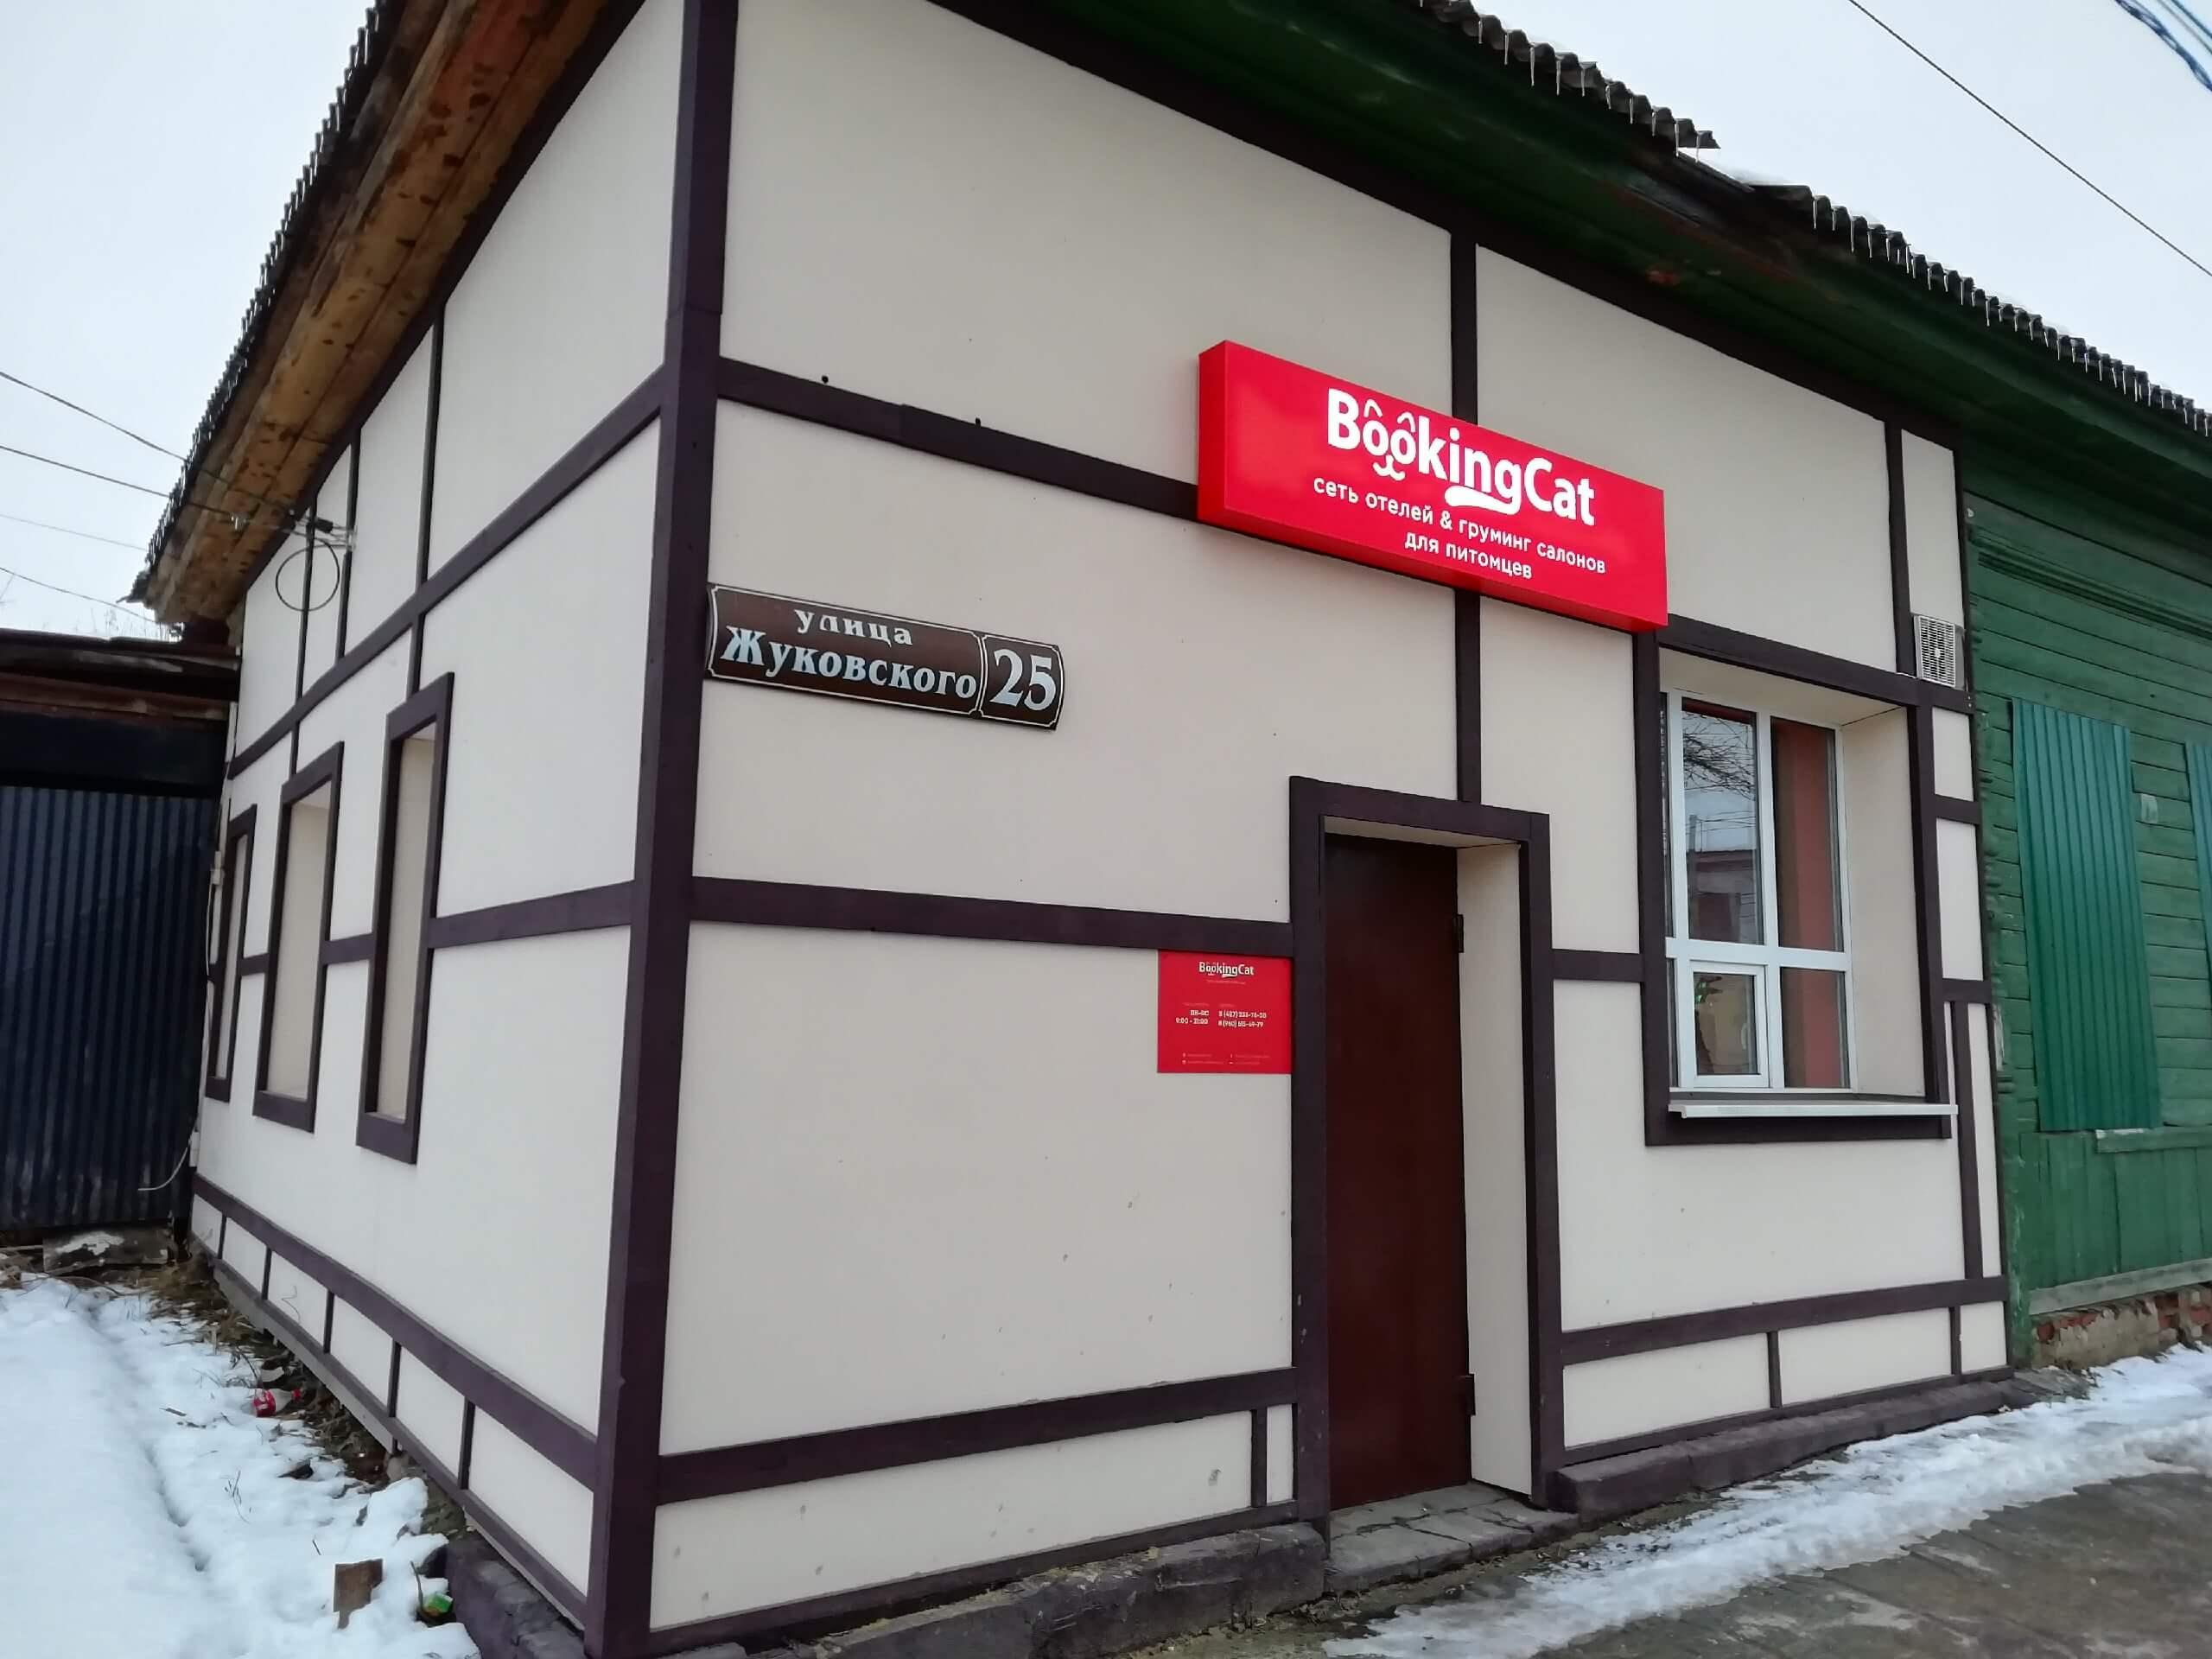 Bookingcat на Жуковского